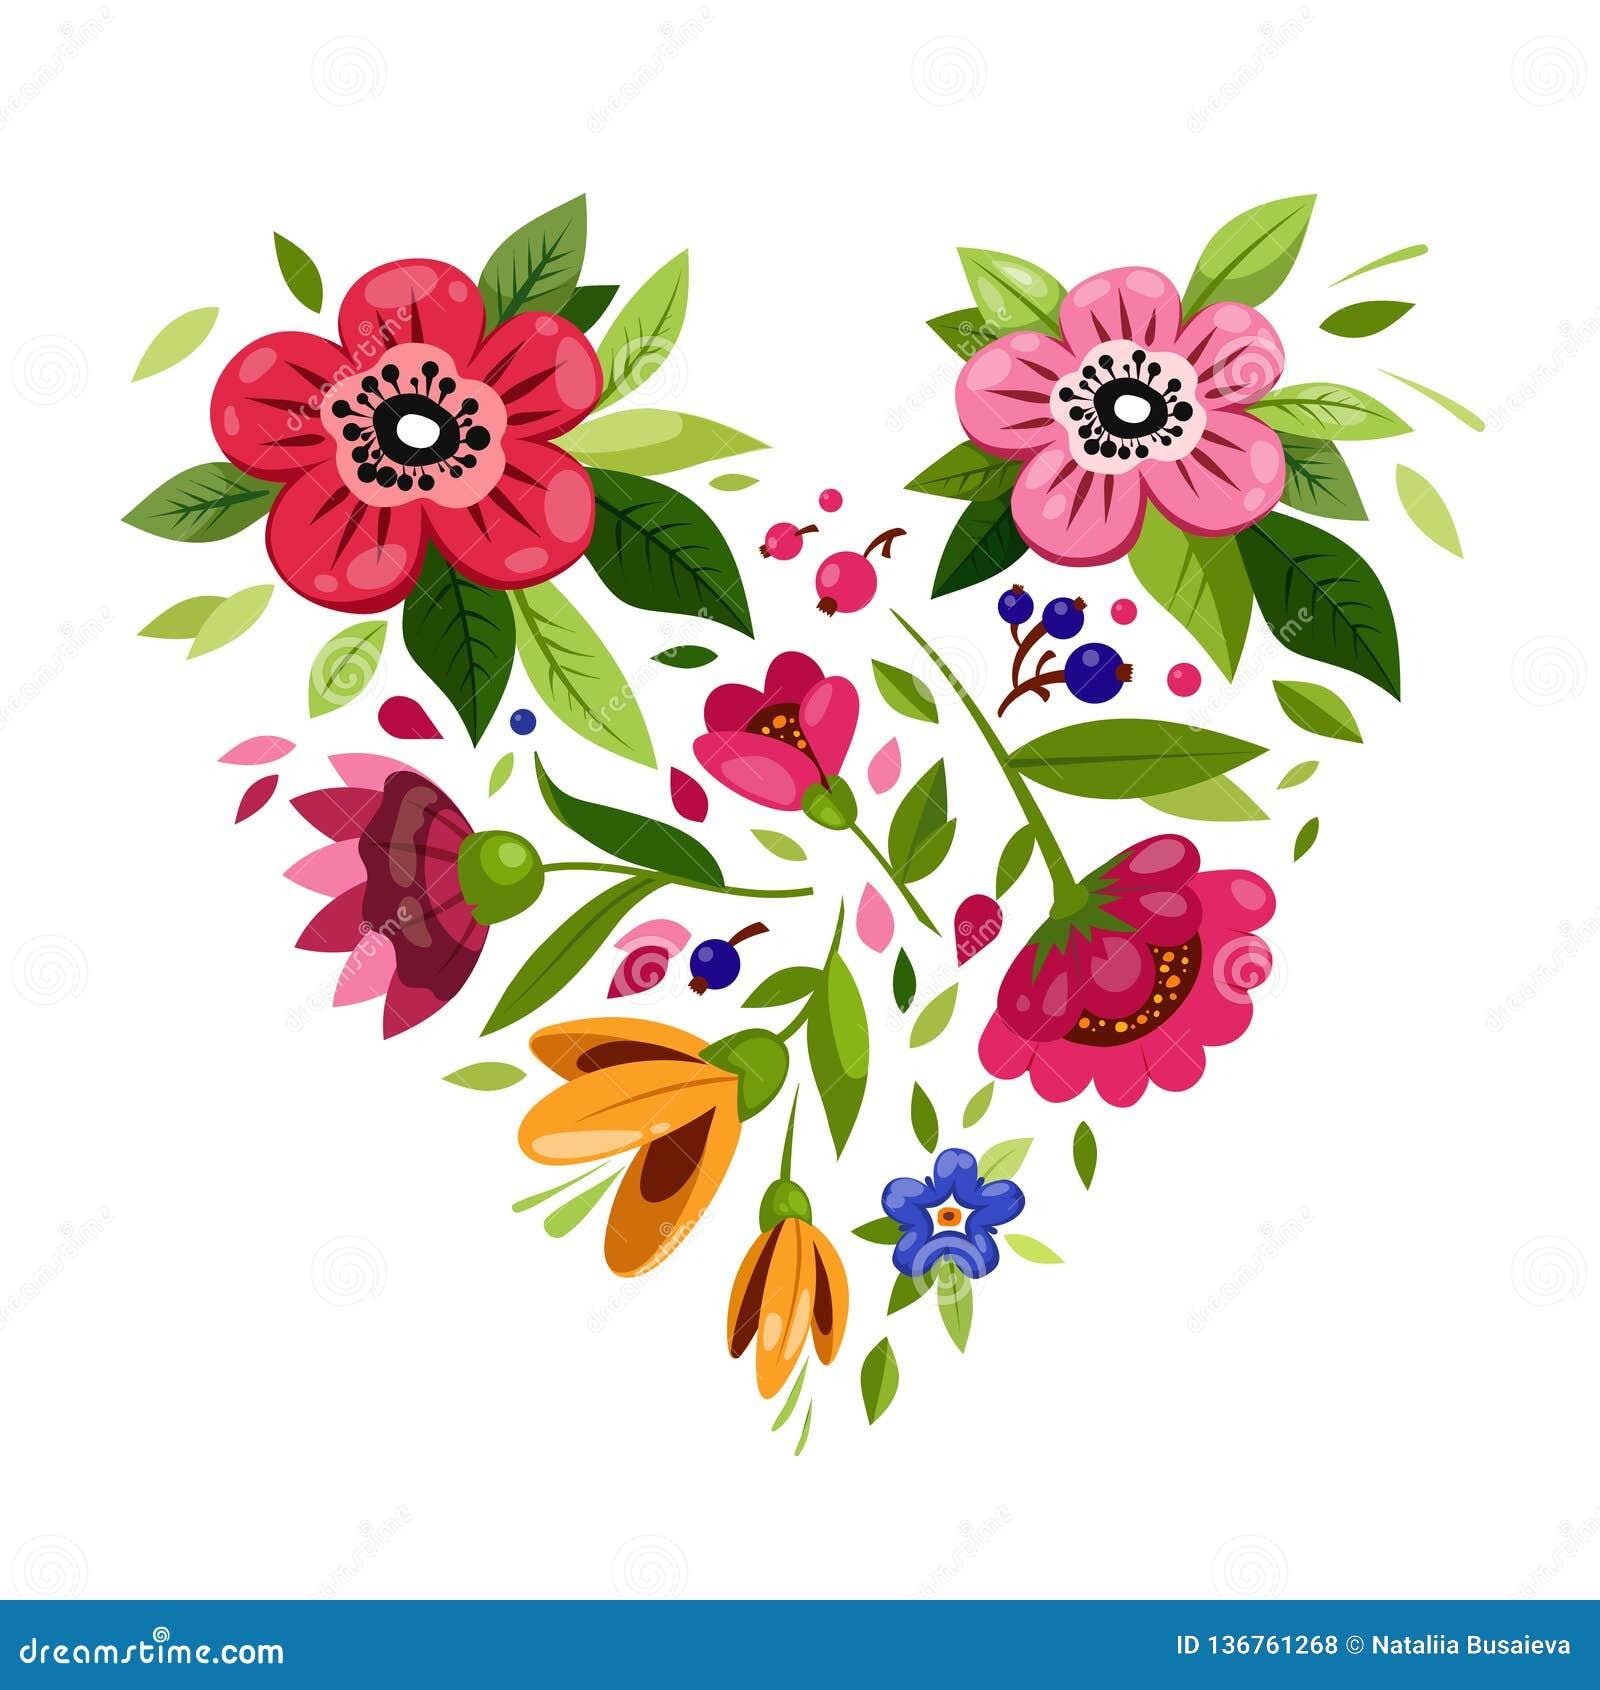 Flower Heart Heart From Flowers Vector Illustration For Holiday